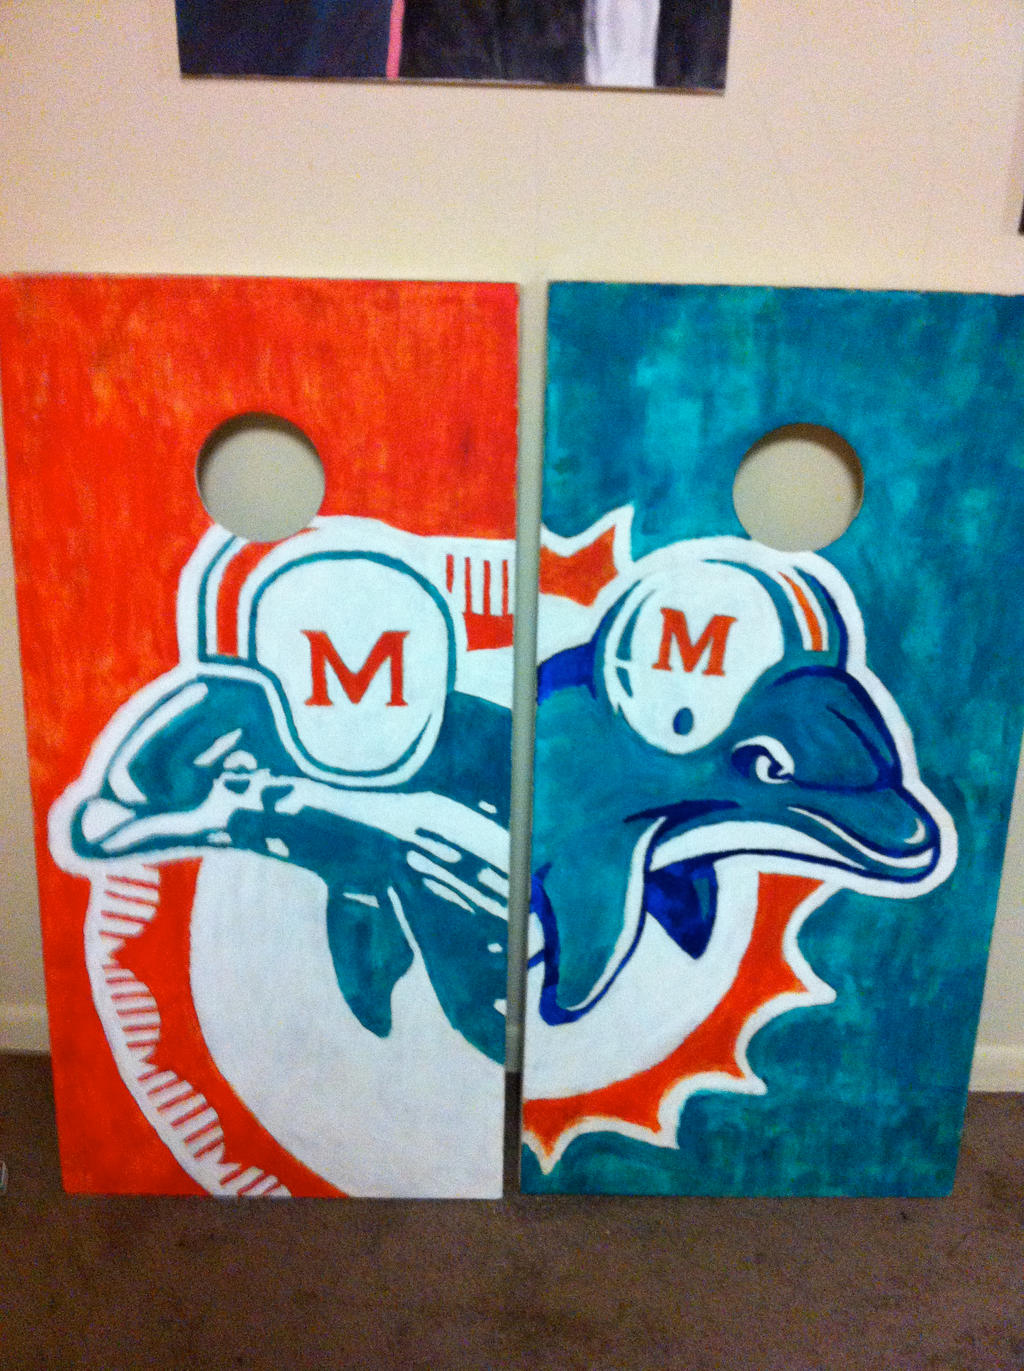 Miami dolphins cornhole set by nova the mind on deviantart miami dolphins cornhole set by nova the mind voltagebd Choice Image